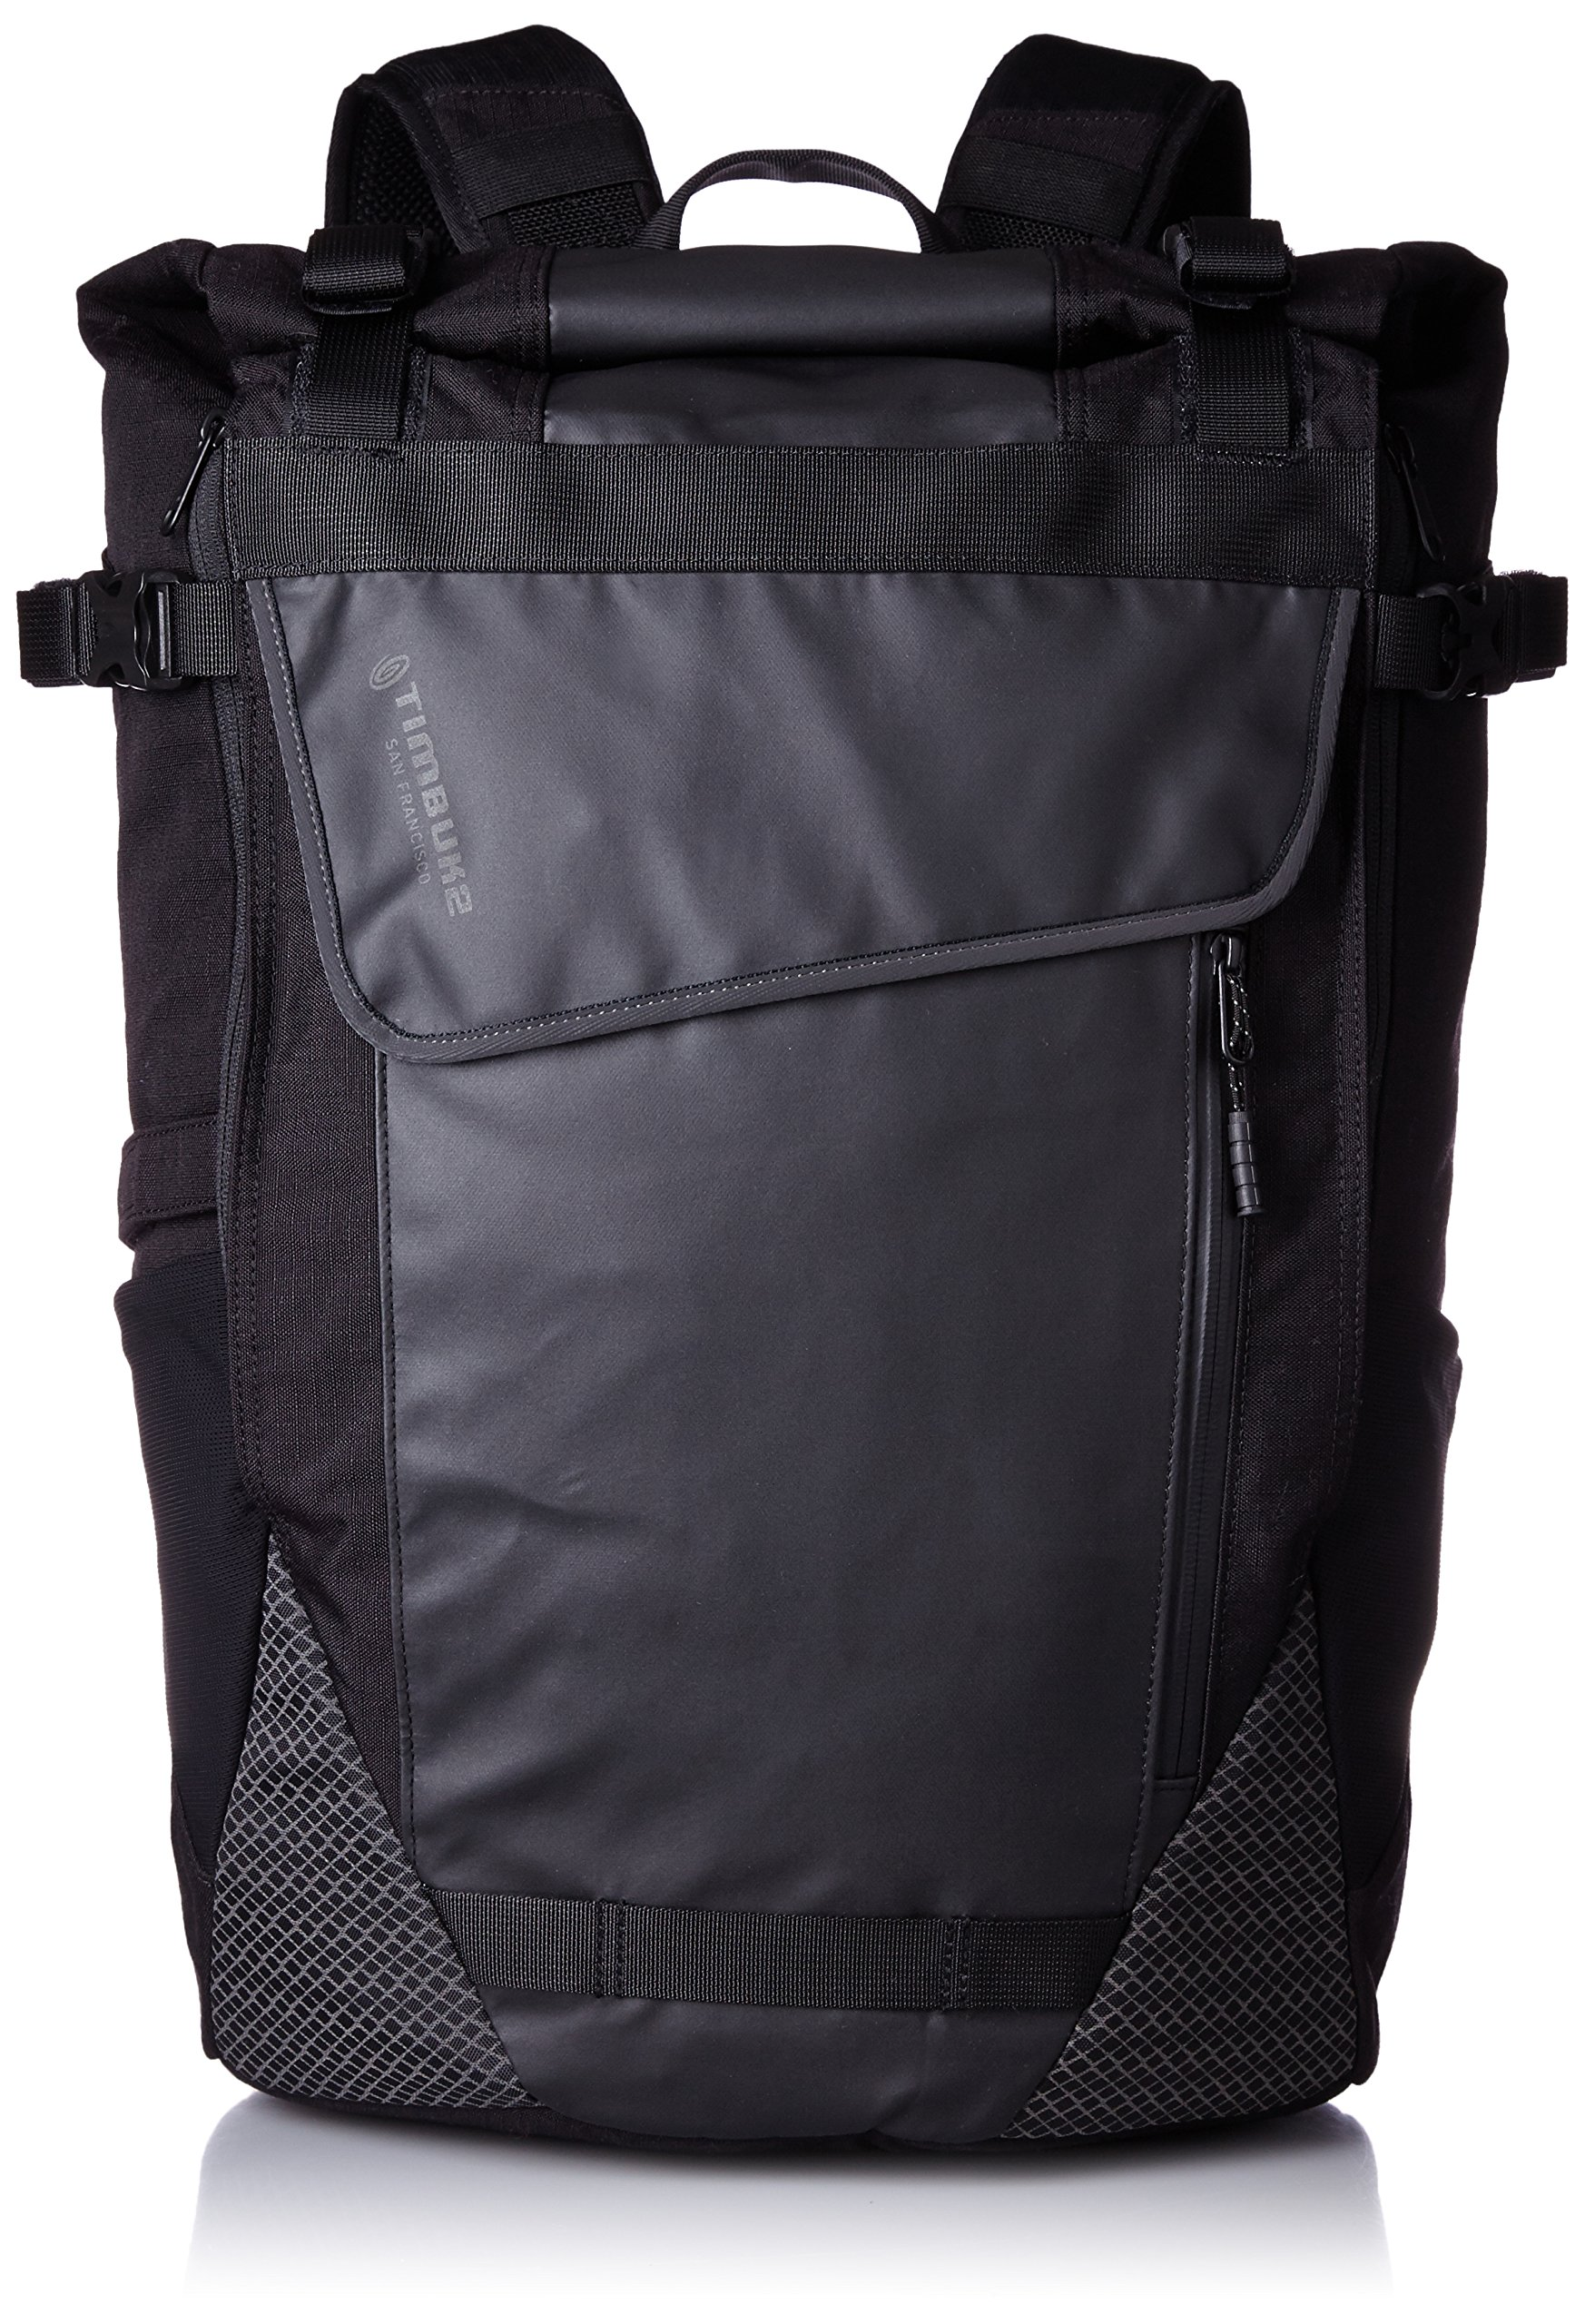 Timbuk2 Designs Especial Tres Cycling Backpack 2014, Black, One Size by Timbuk2